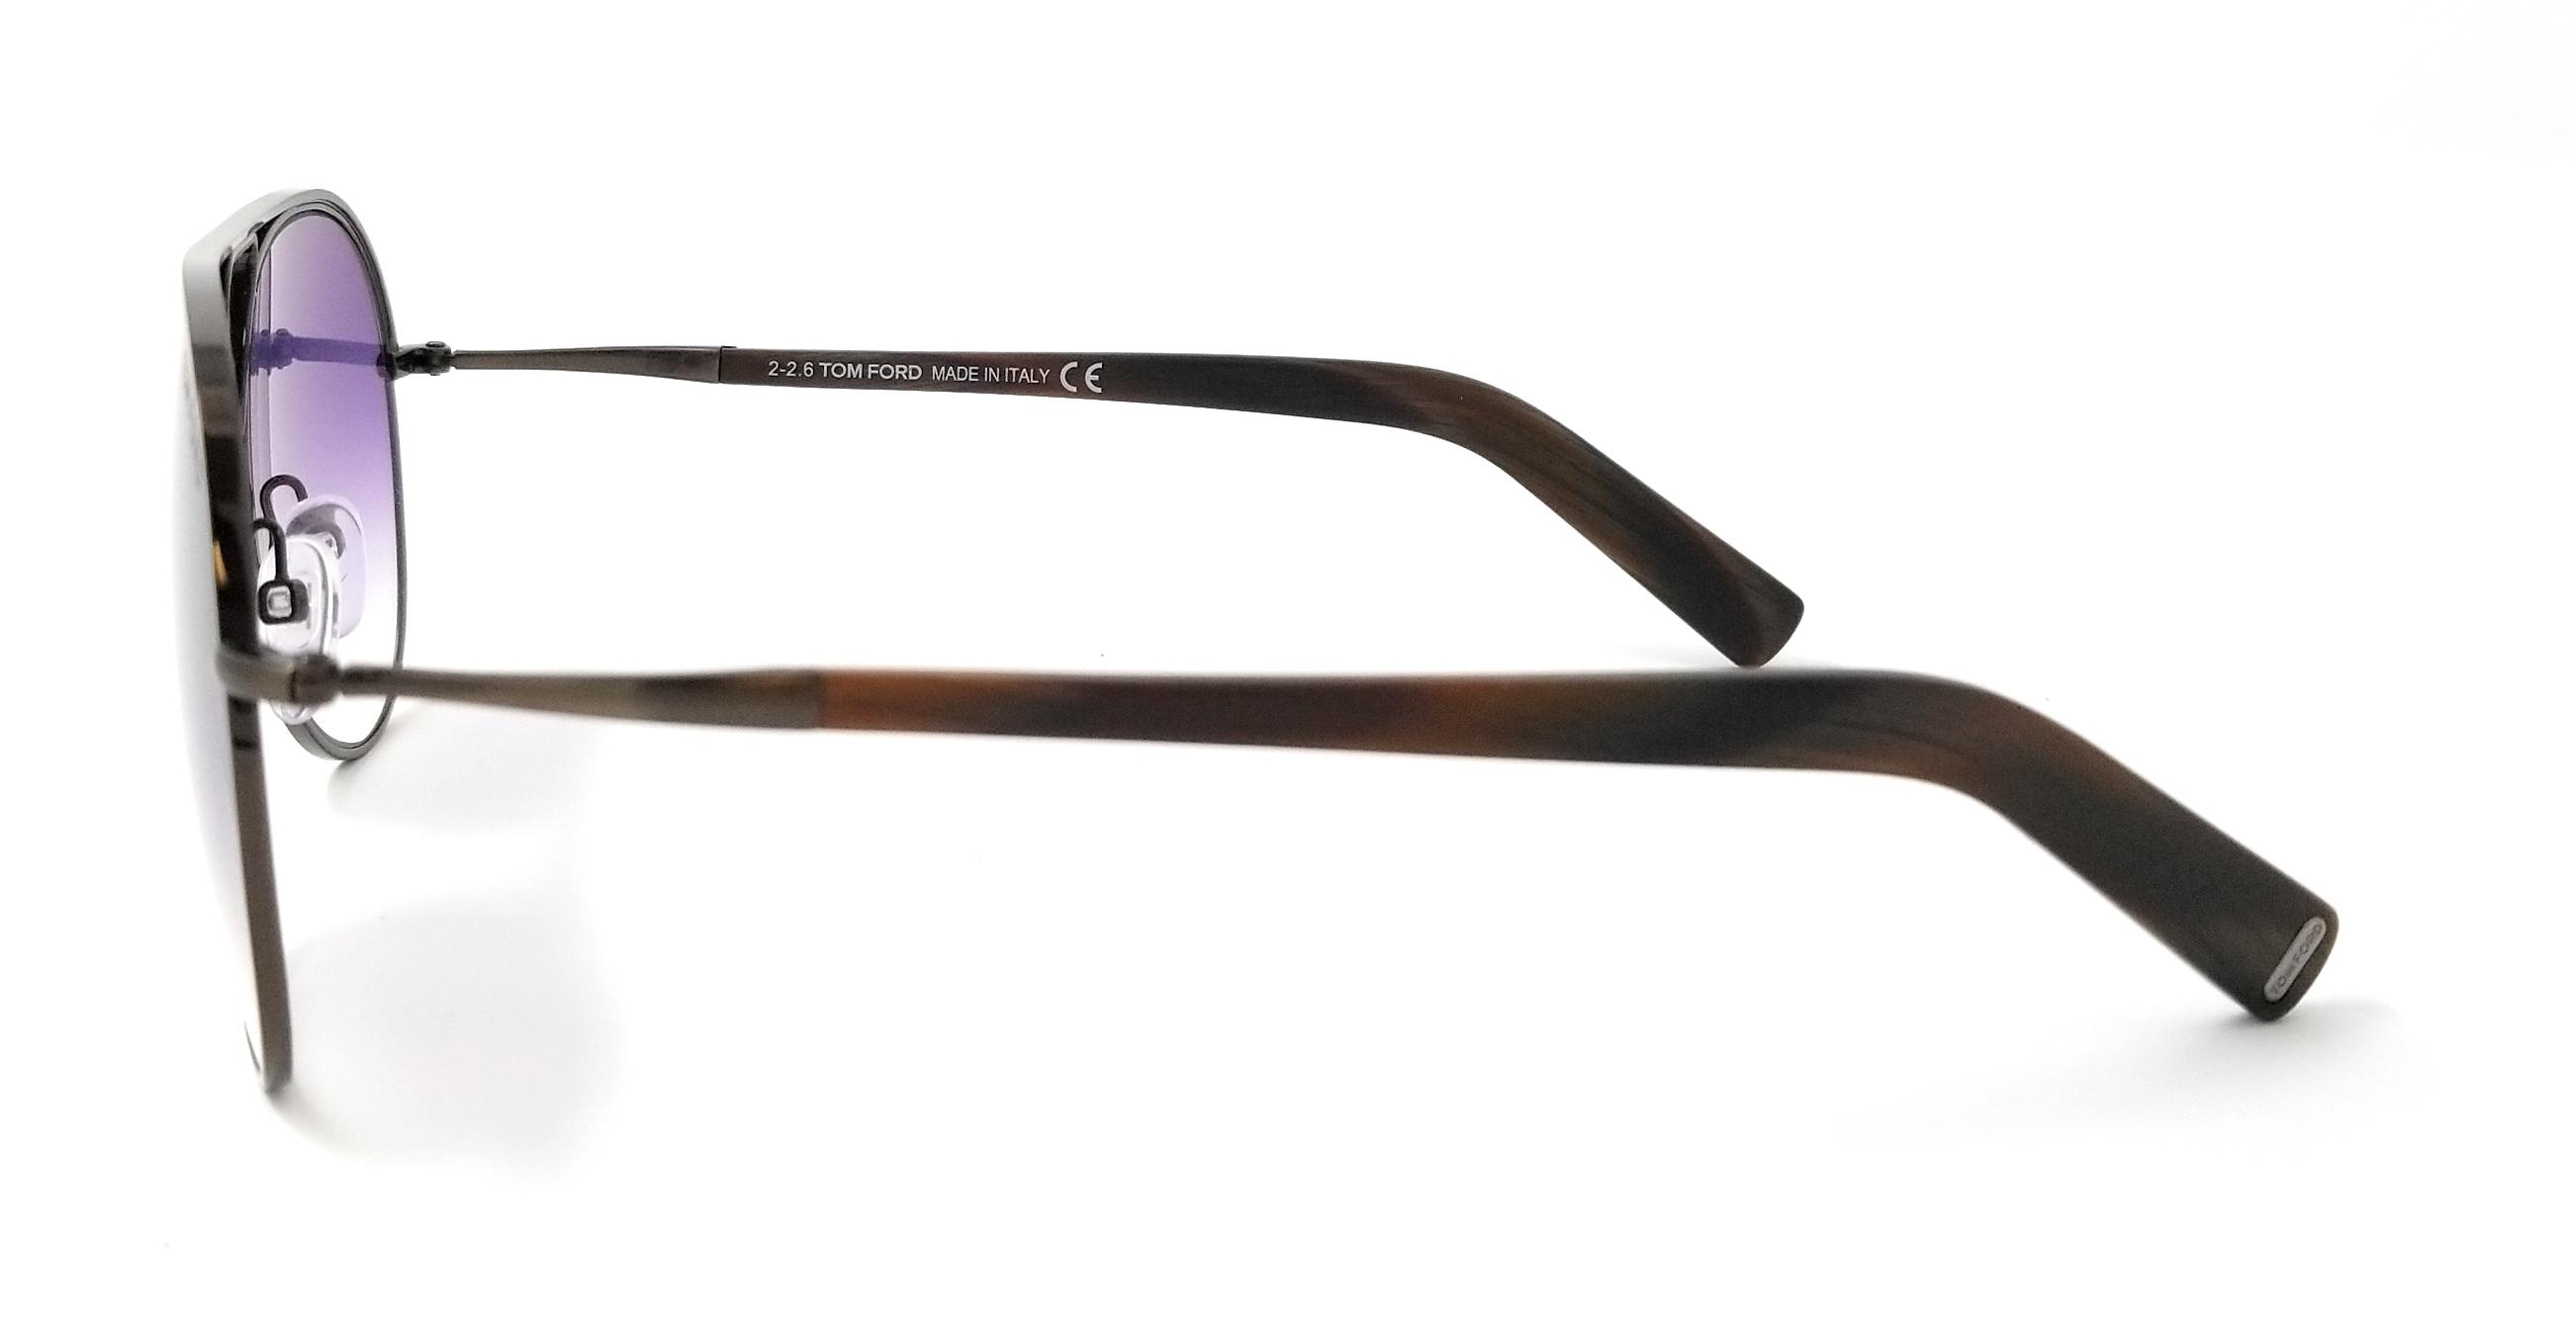 3d4b8e113f223 Tom Ford Sunglasses FT0448 48Z Shiny Gunmetal Dark Brown   Purple Gradient